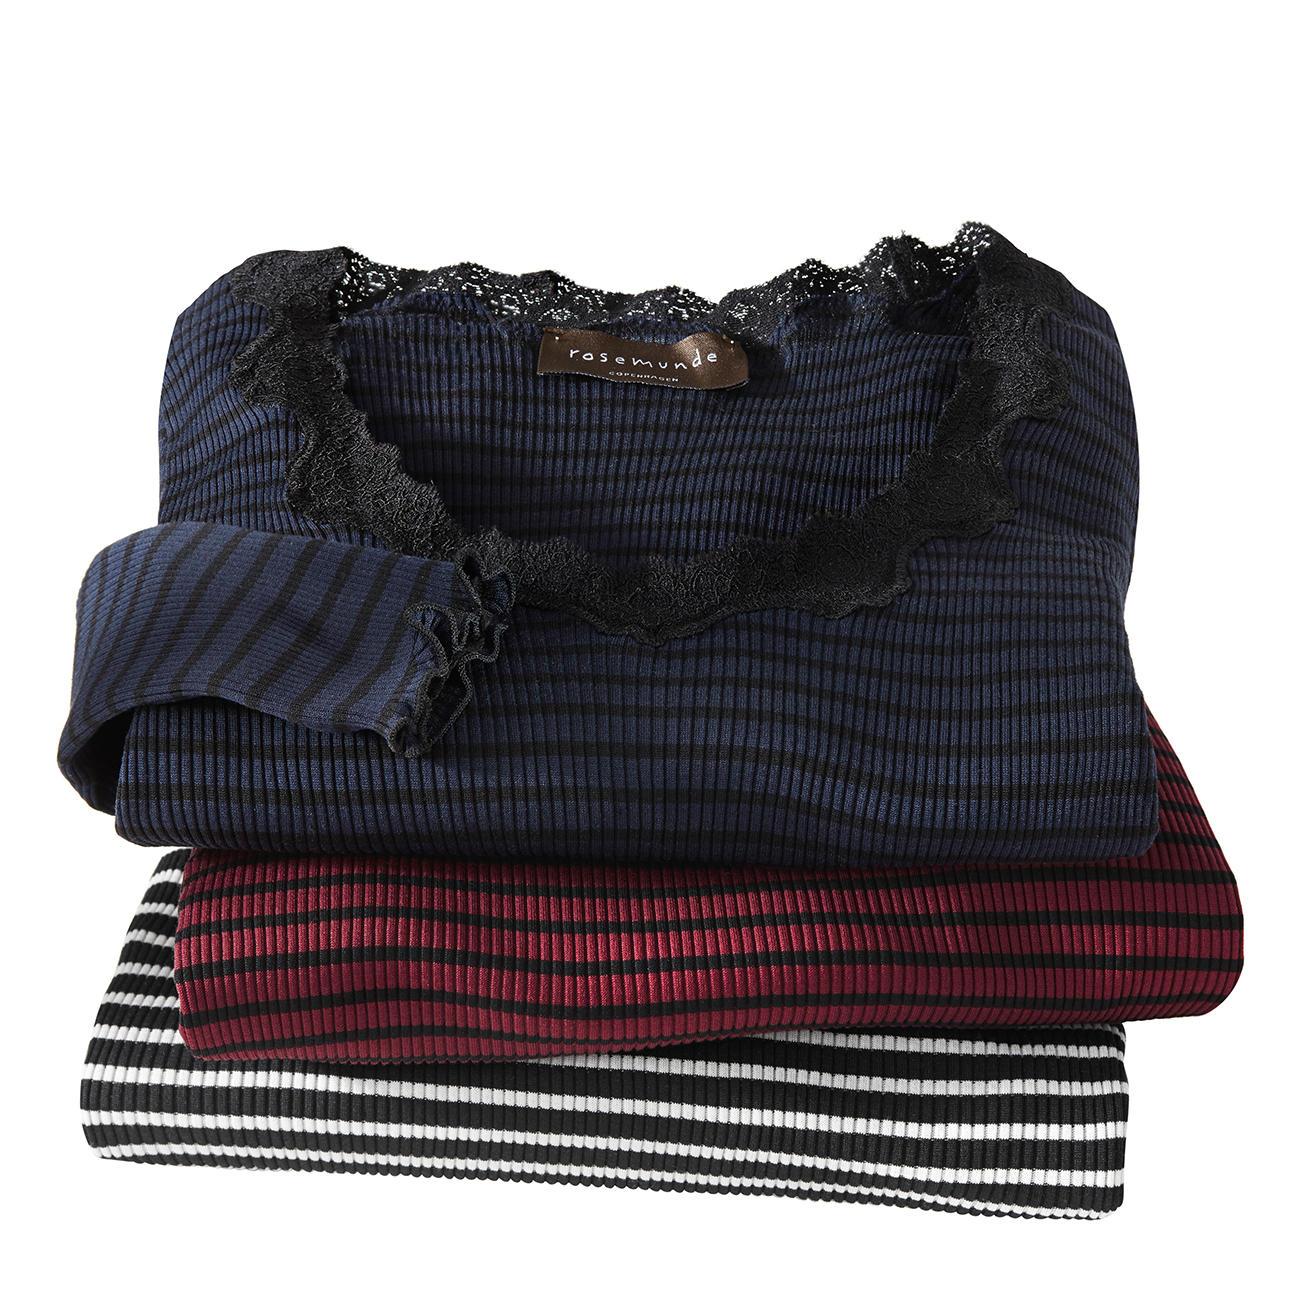 rosemunde copenhagen ringel spitzenshirt entdecken. Black Bedroom Furniture Sets. Home Design Ideas